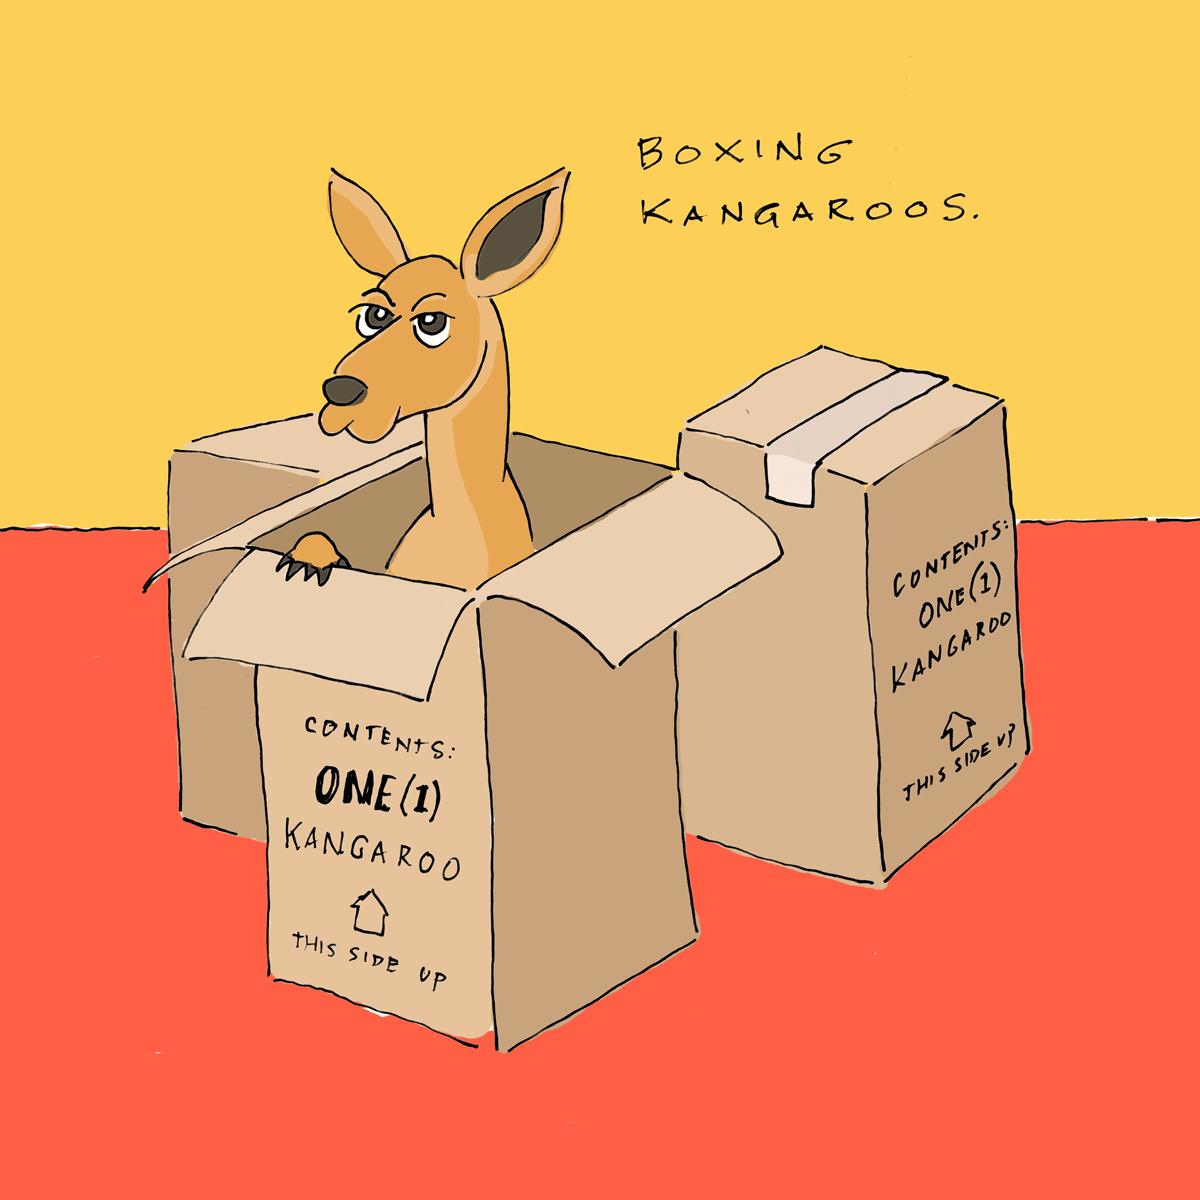 Boxing-Kanagroos-97.png